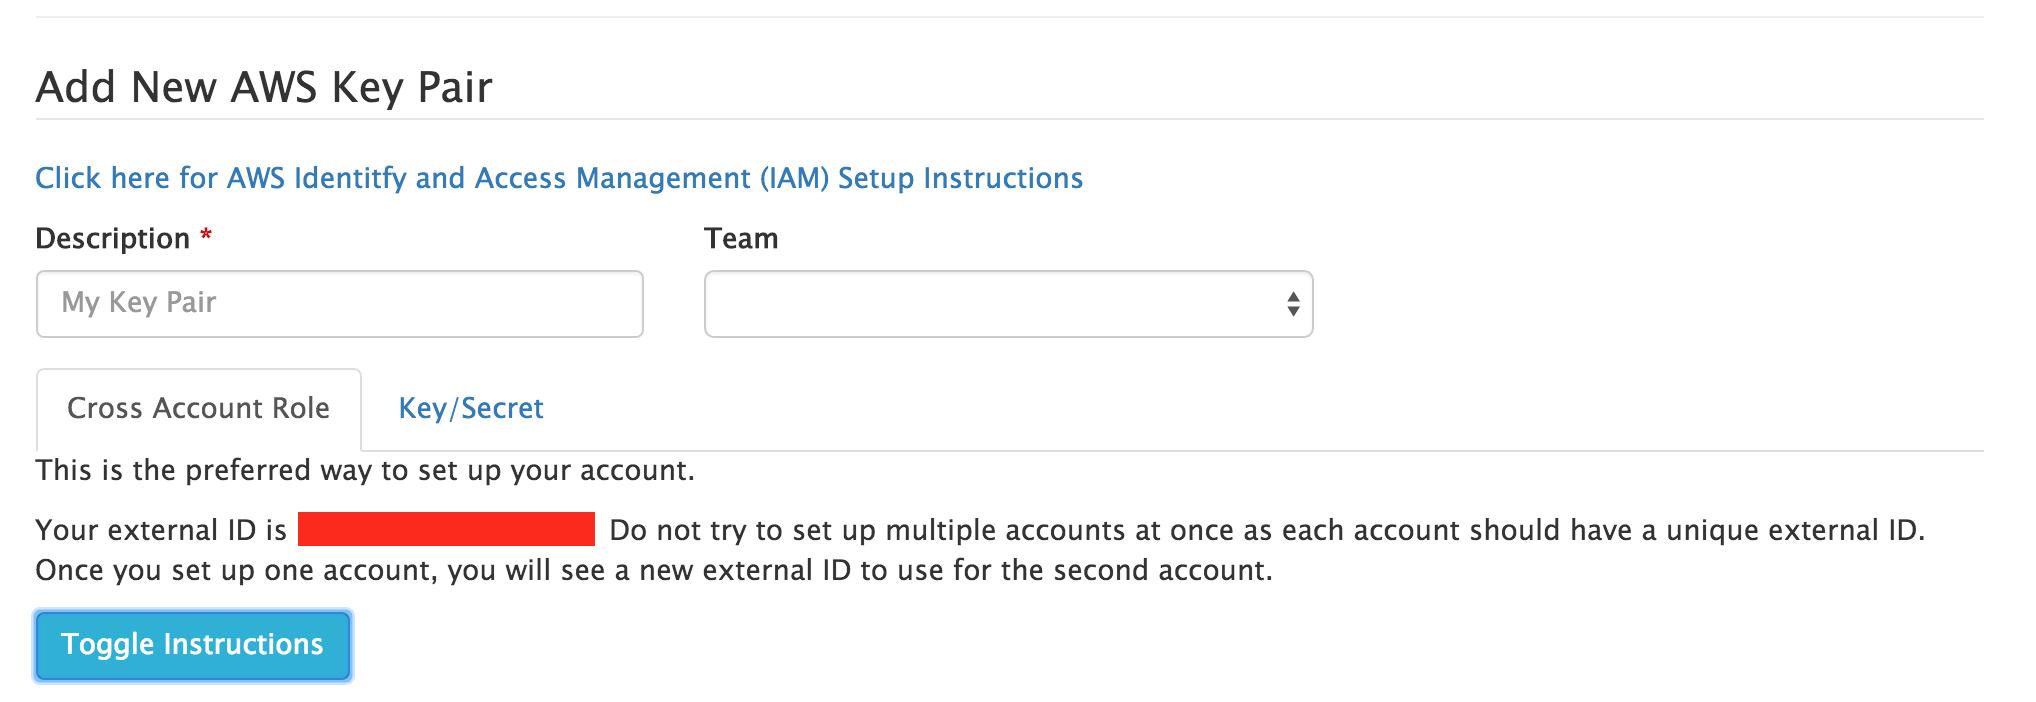 AWS Identify and Access Management (IAM) Setup Instructions